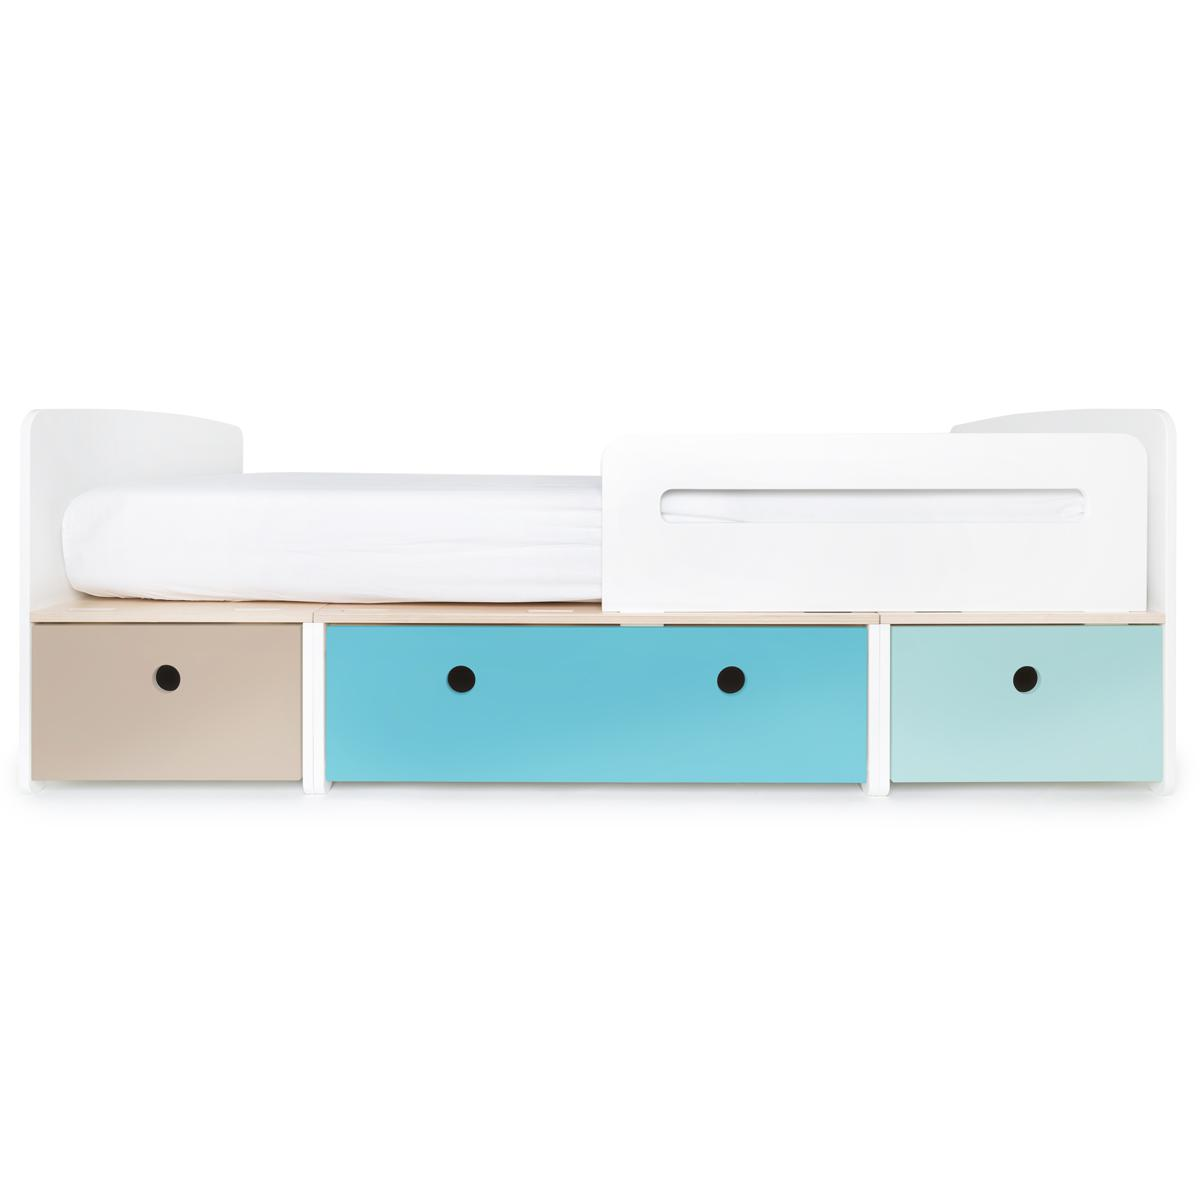 Kinderbett 90x200cm COLORFLEX warm grey-paradise blue-sky blue